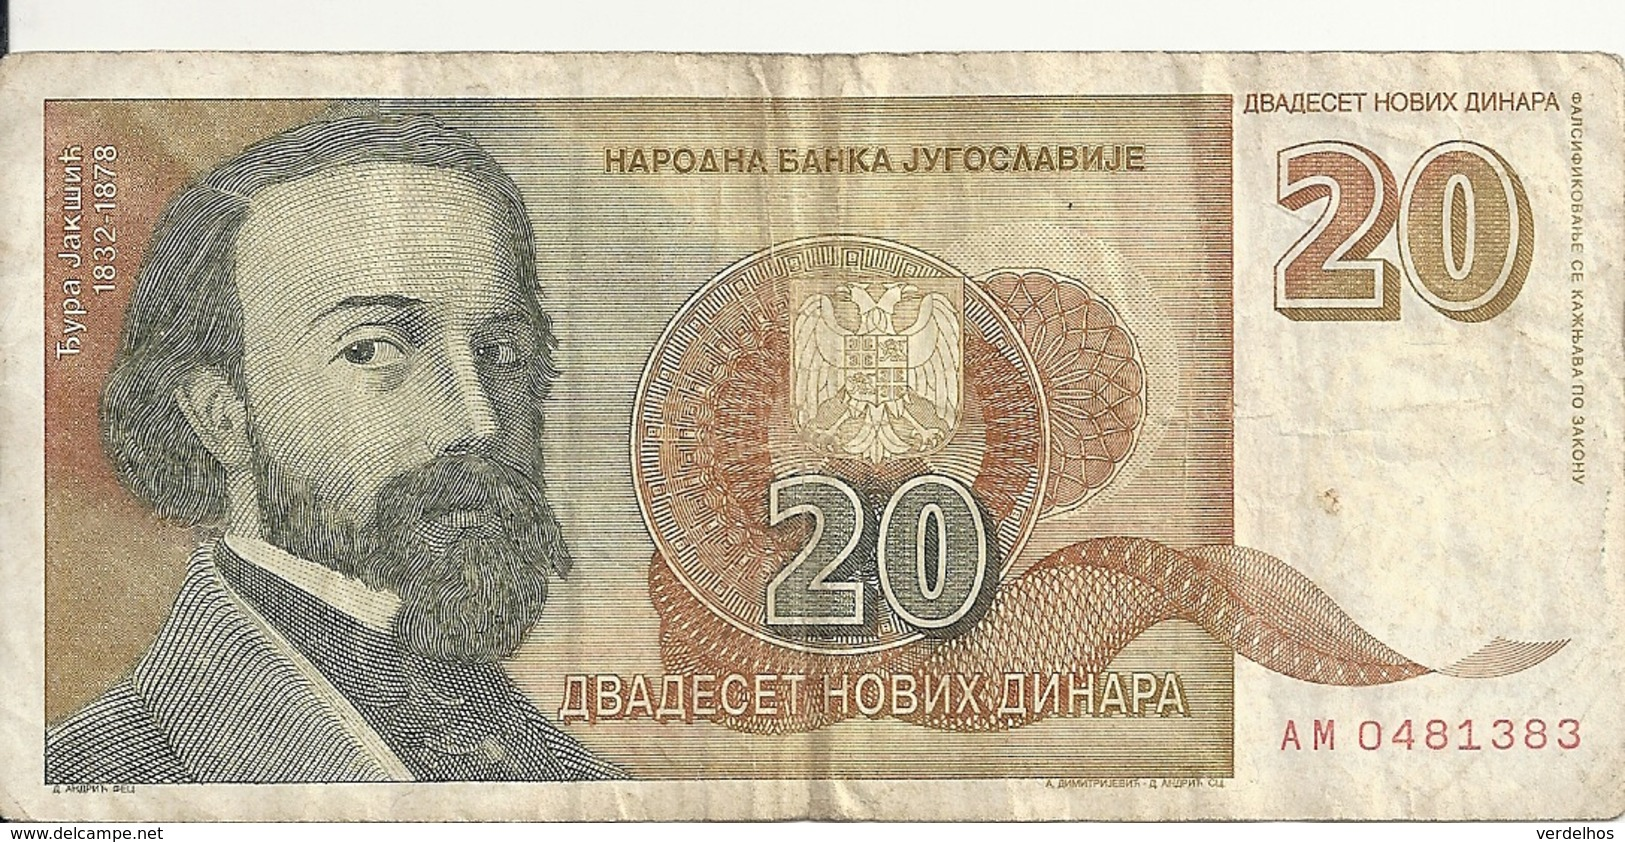 YOUGOSLAVIE 20 NOVIH DINARA 1994 VF P 150 - Jugoslawien